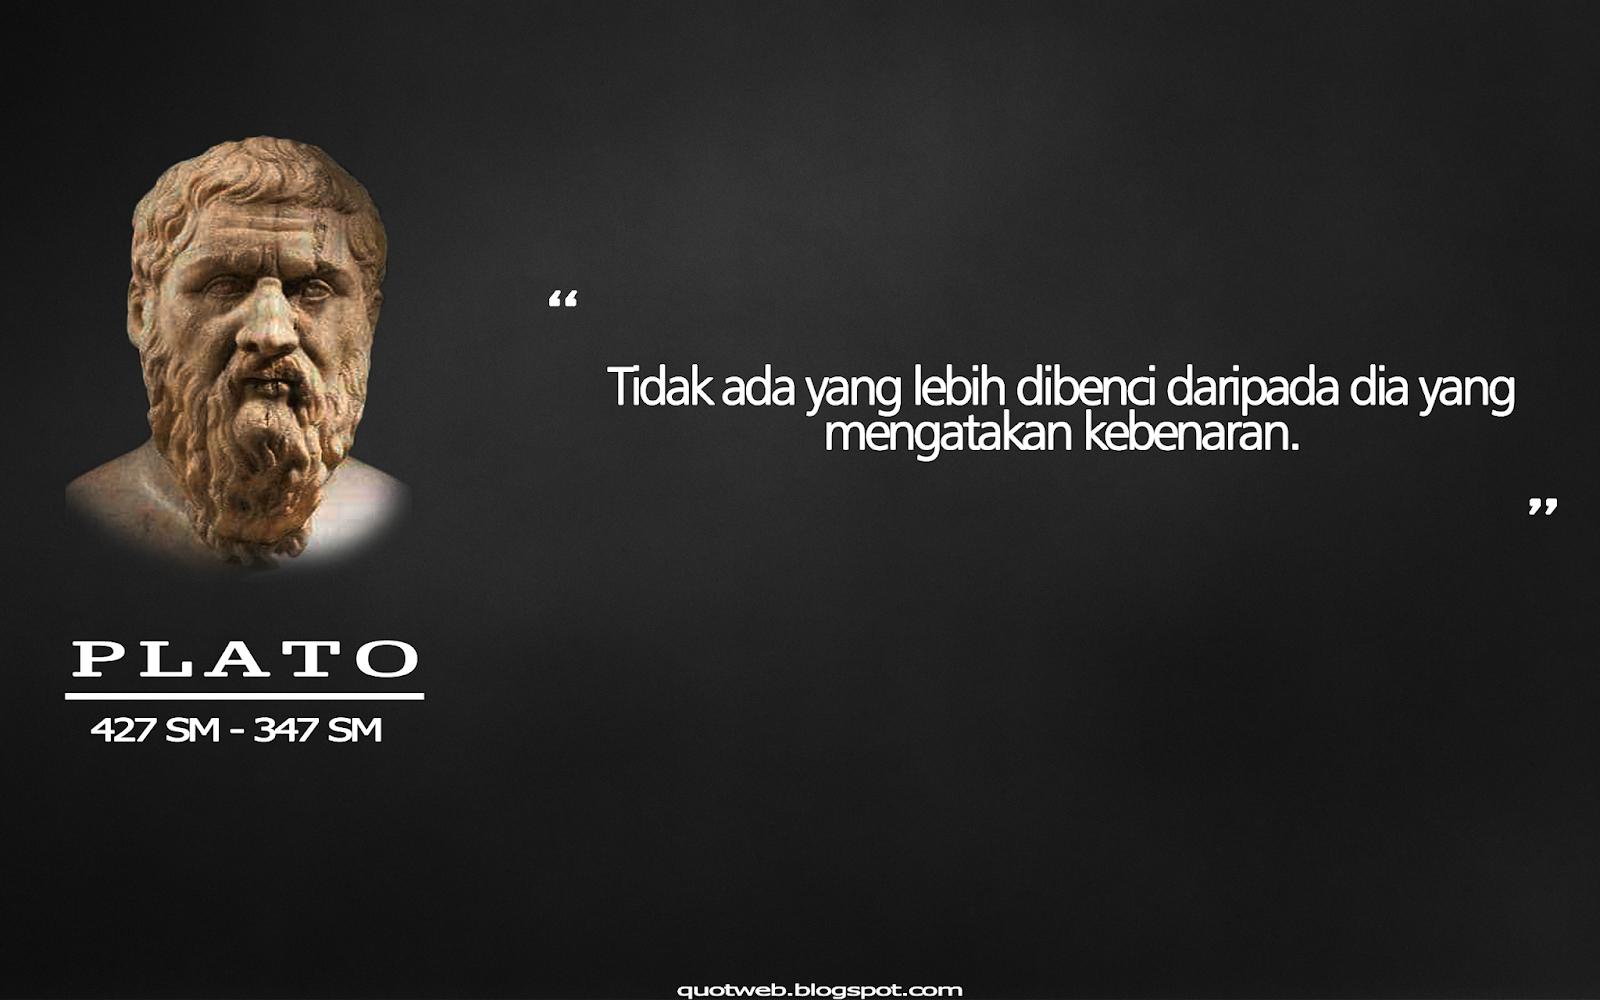 Kumpulan Kata Bijak Plato Quotweb